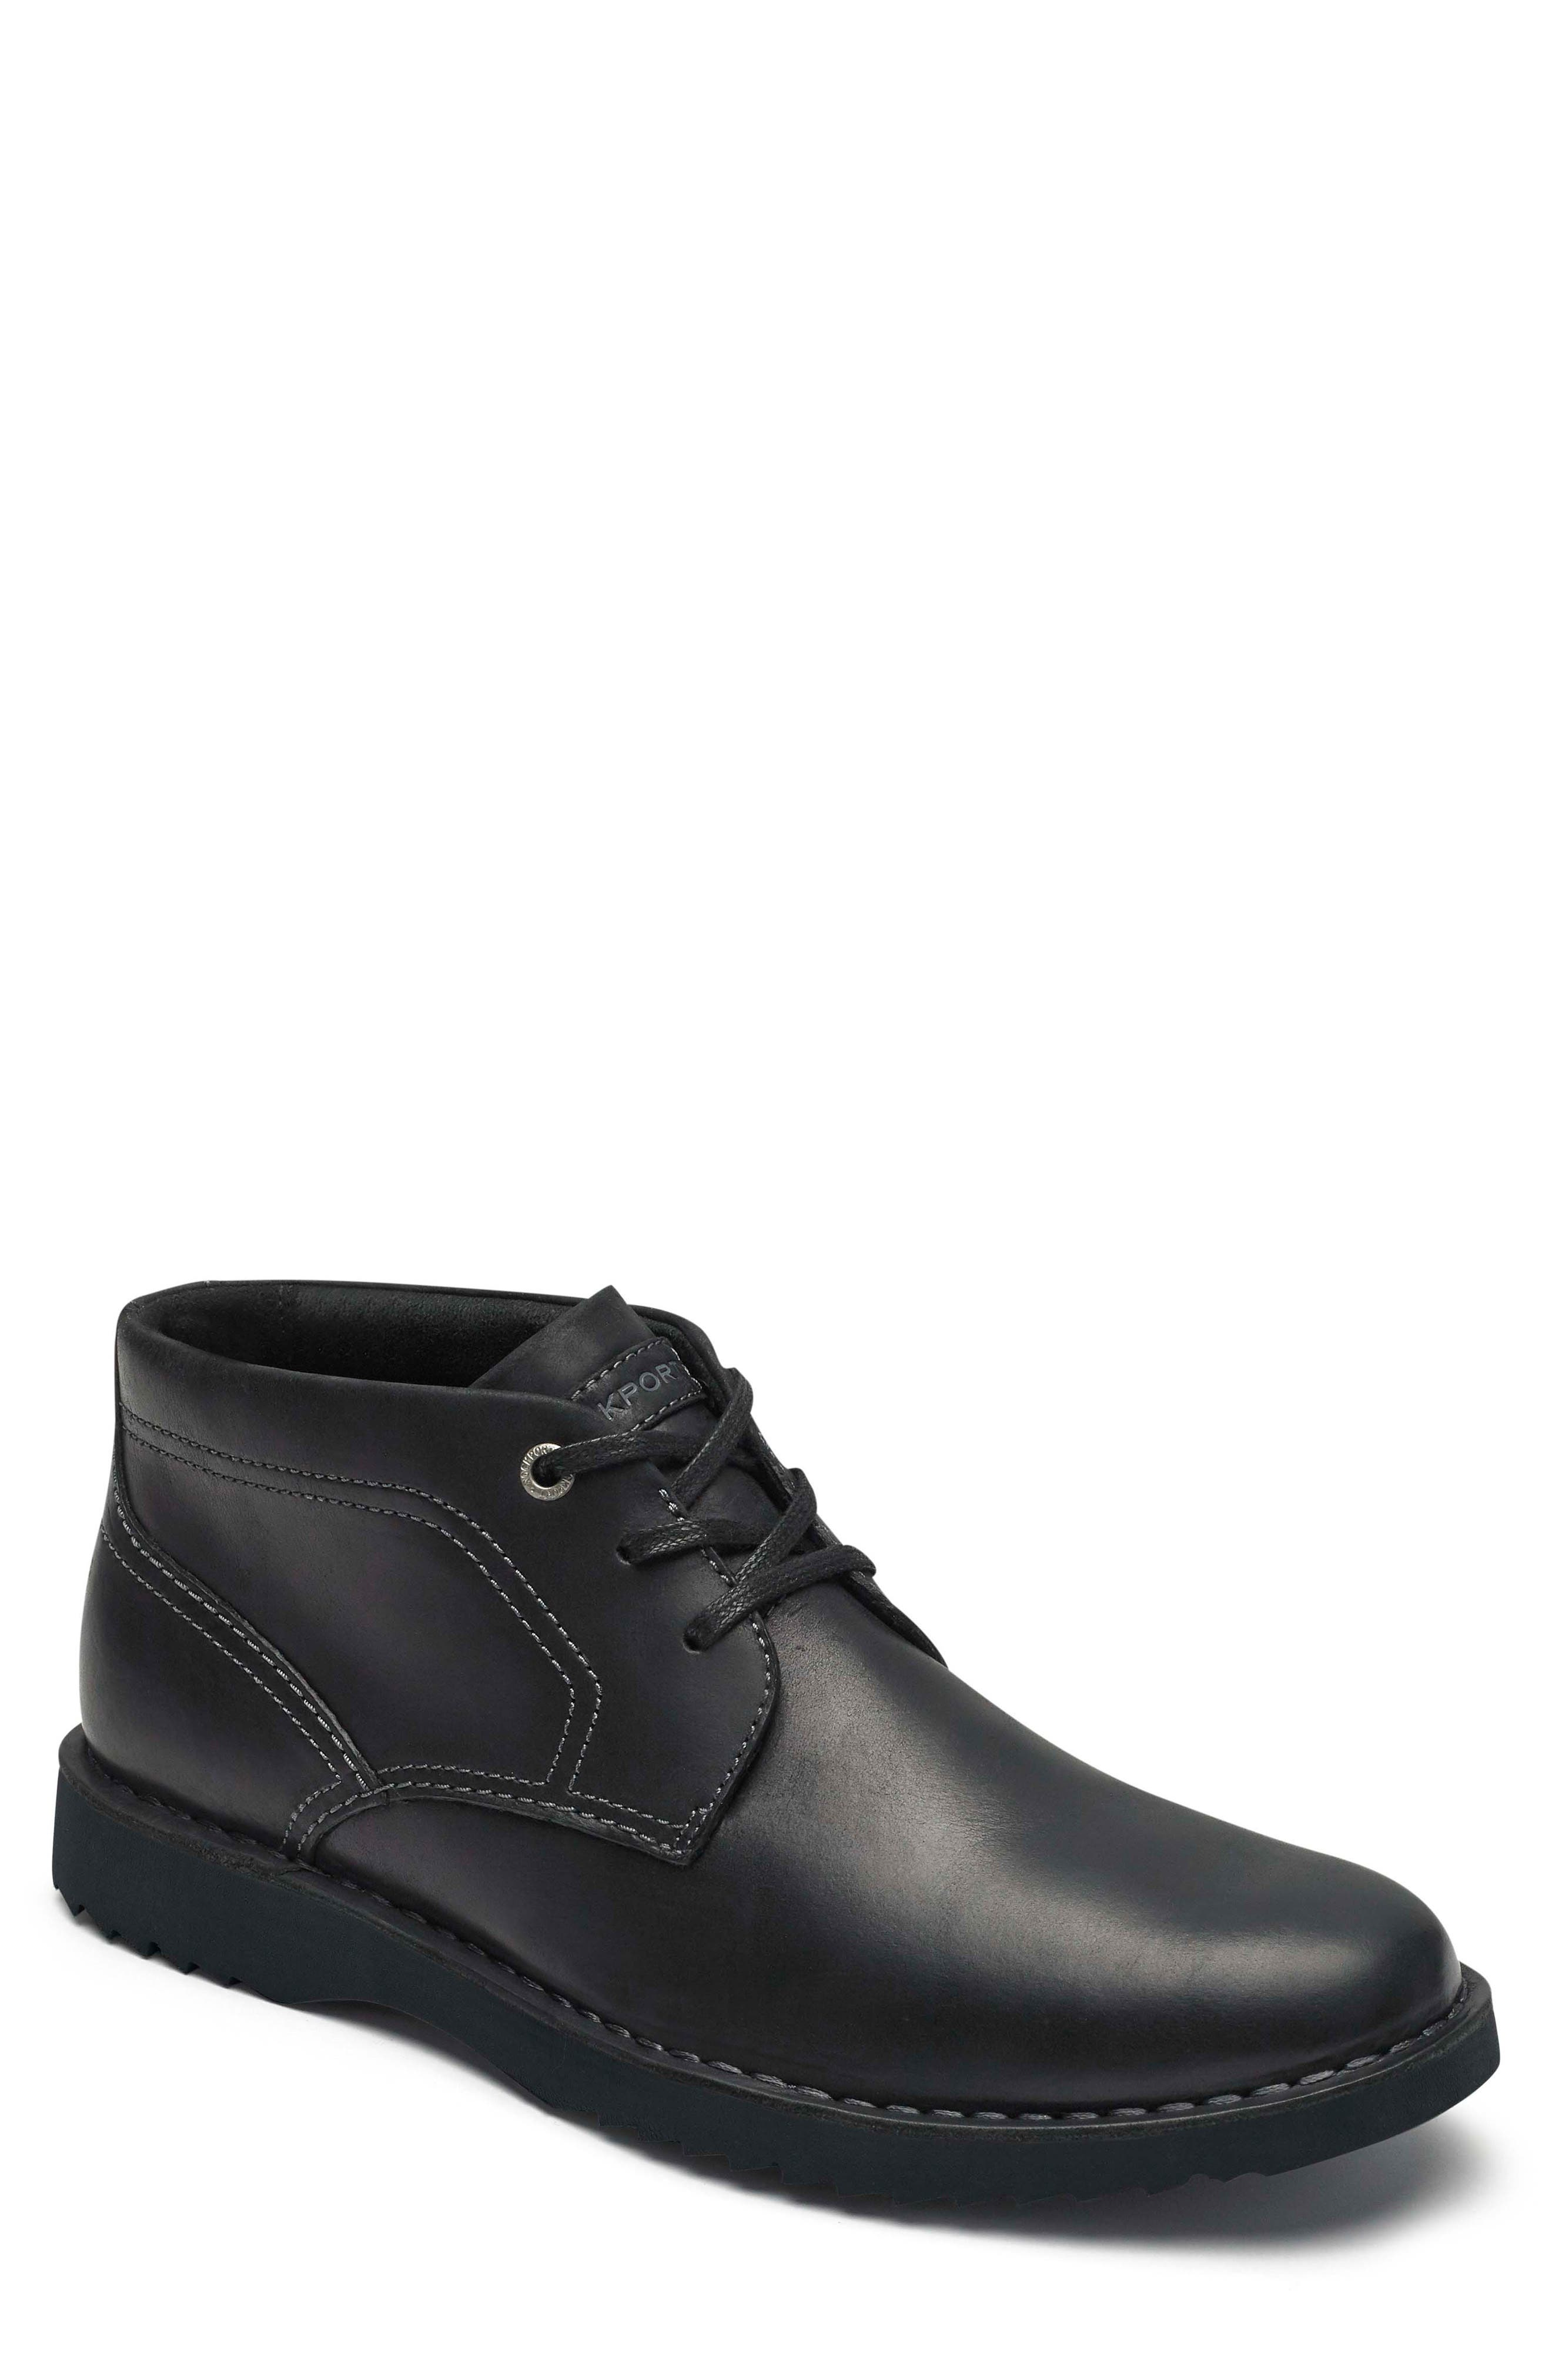 Rockport Cabot Chukka Boot, Black